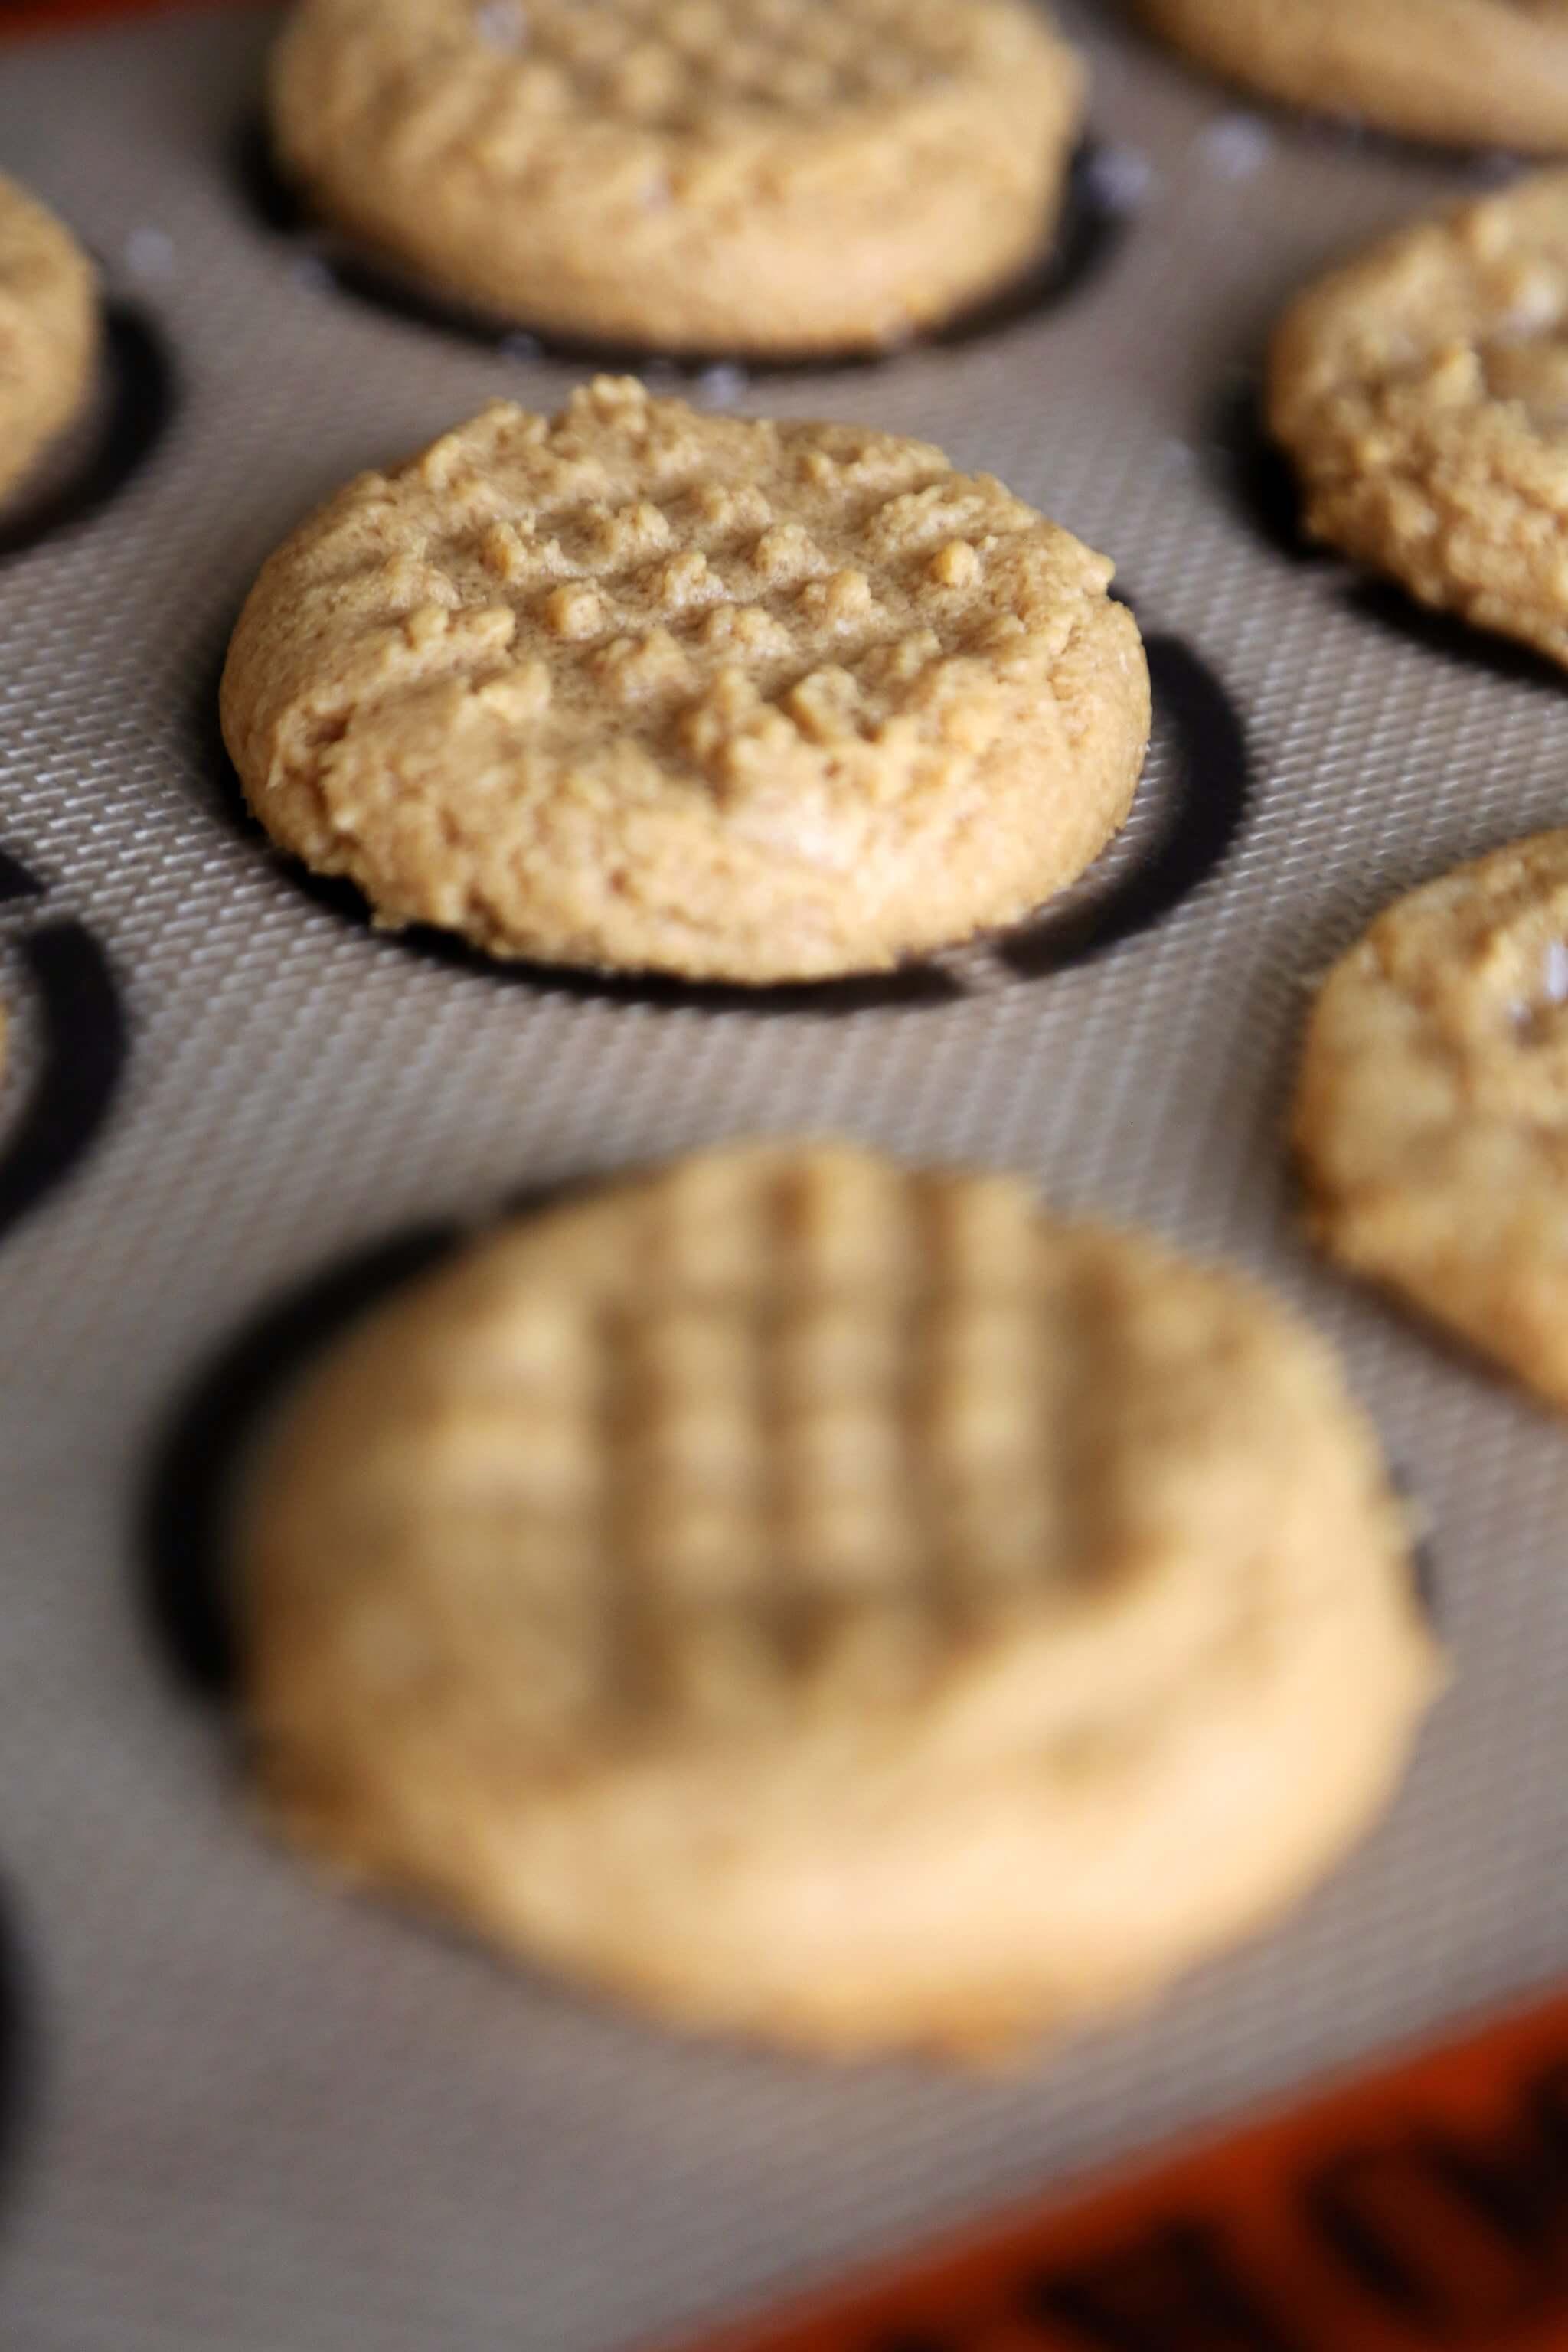 4-Ingredient Peanut Butter Cookie